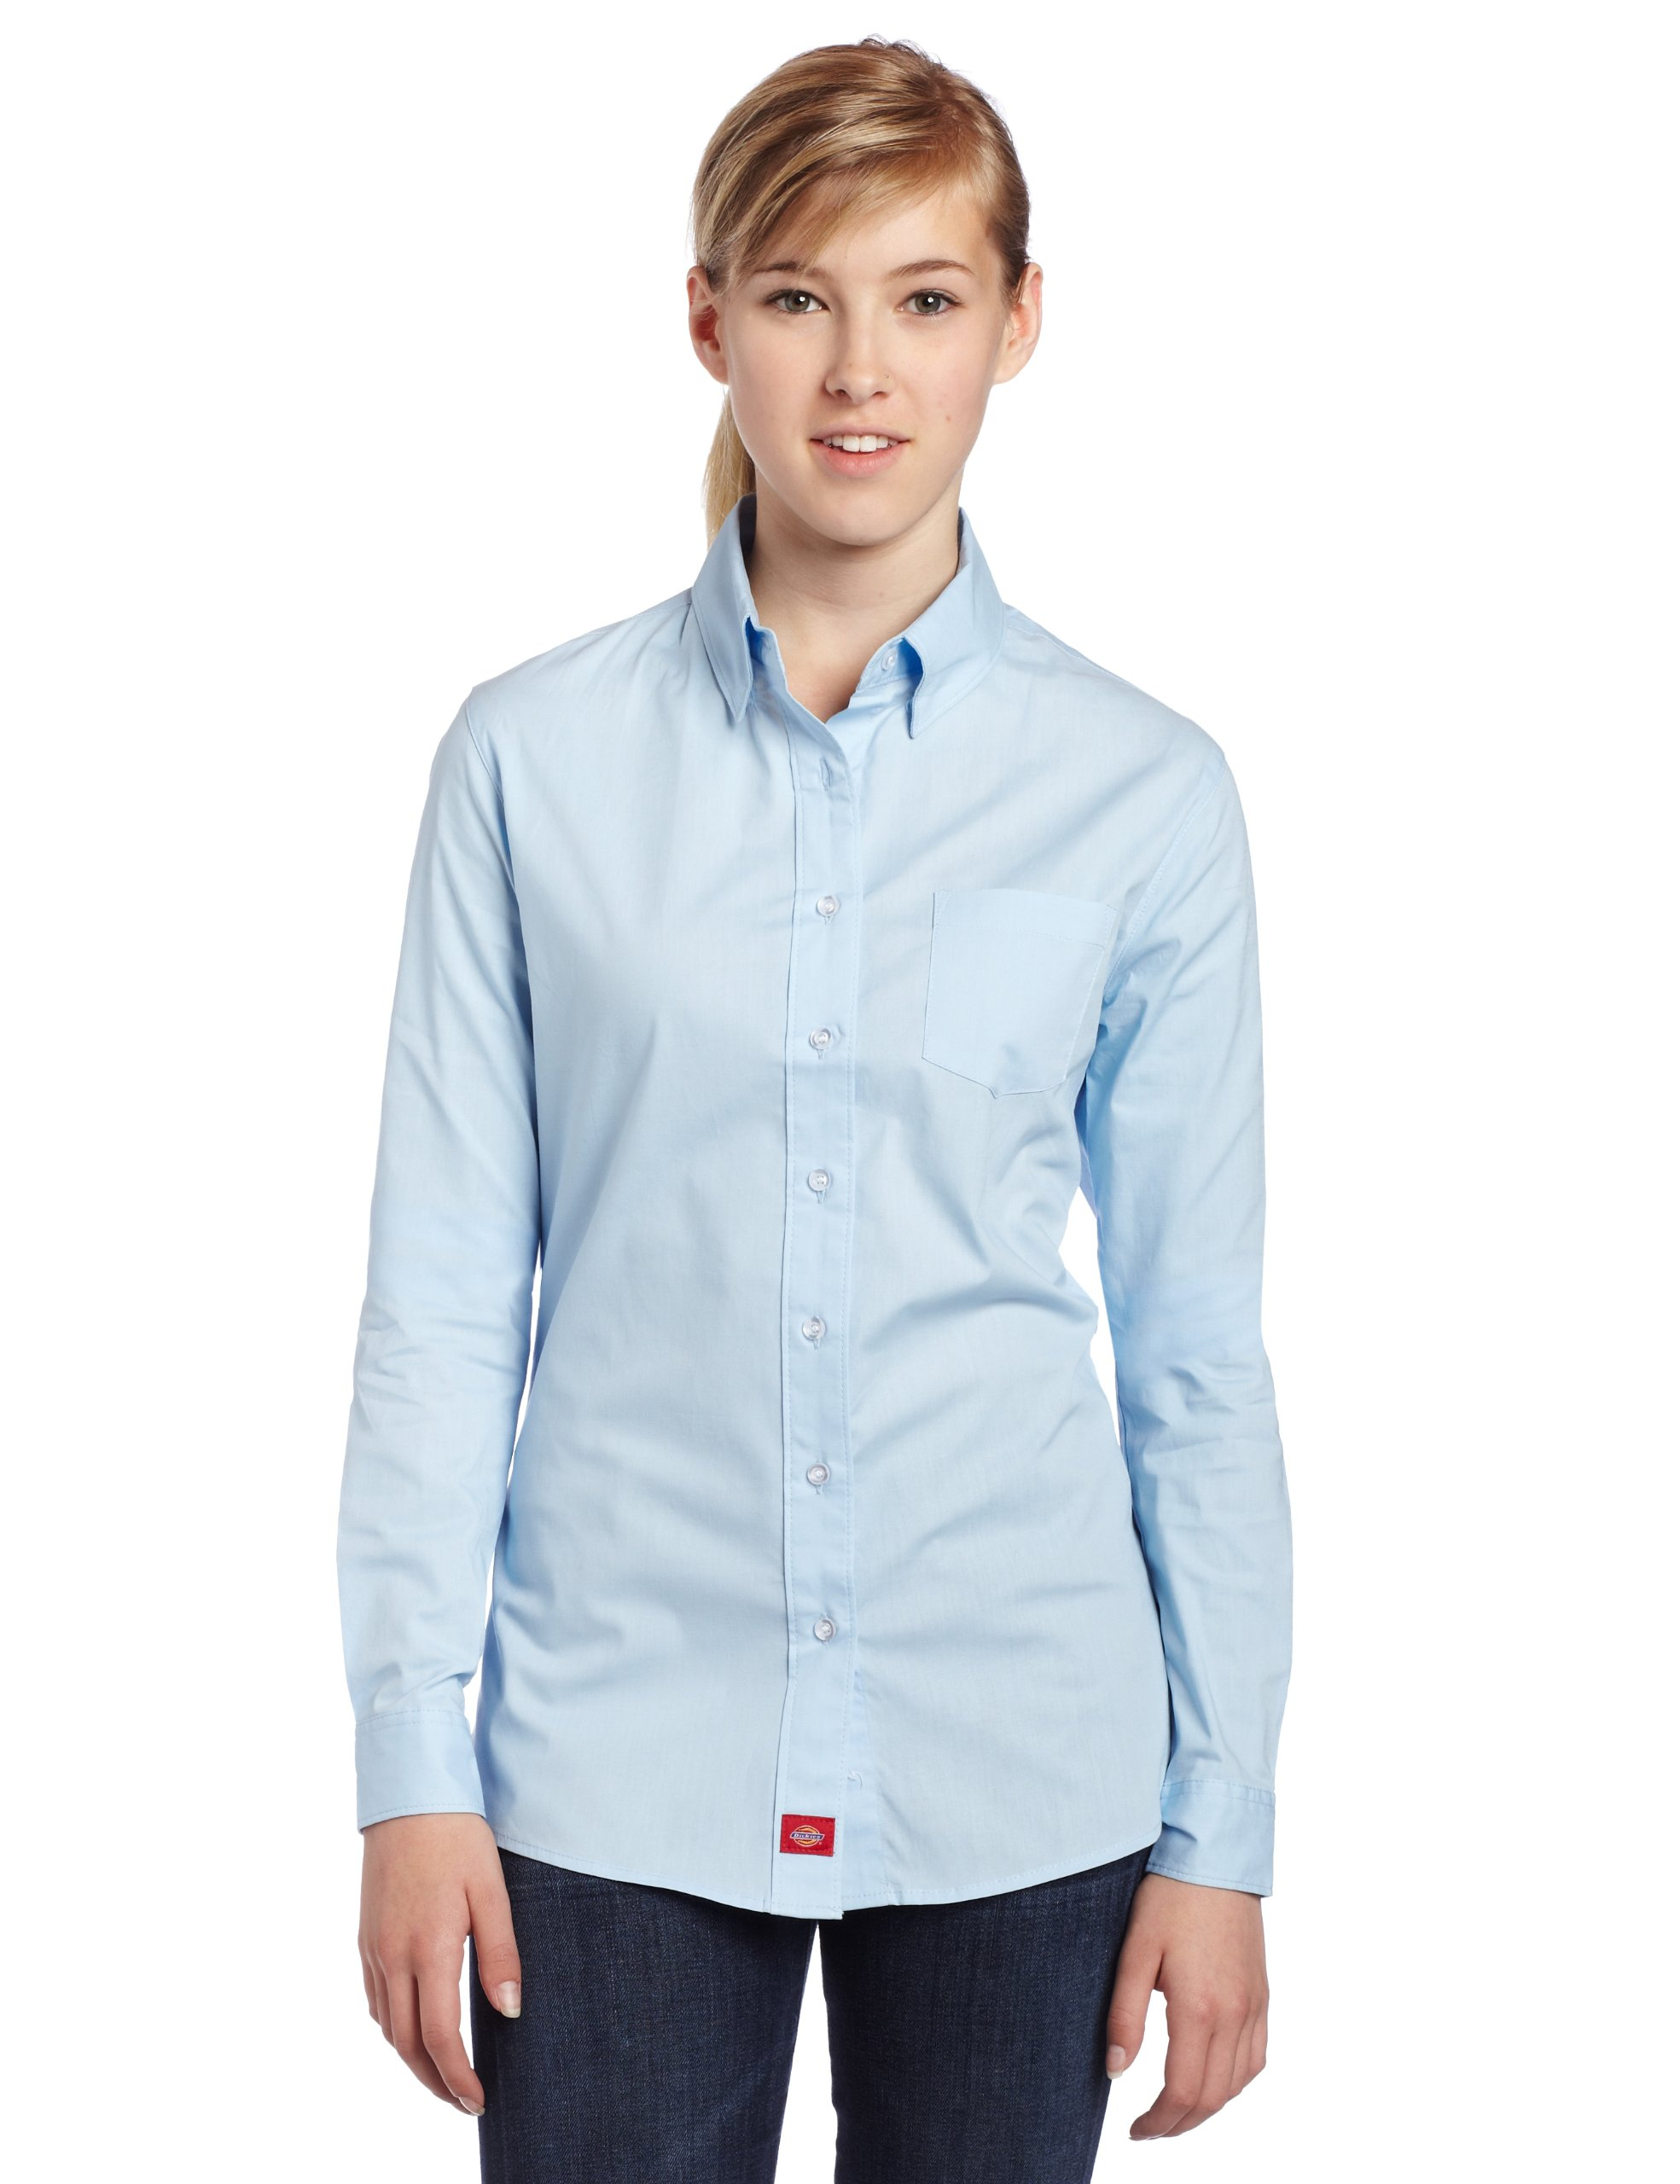 Dickies Girl Juniors Long Sleeve Button Front Poplin Shirt,Baby Blue,Xlarge